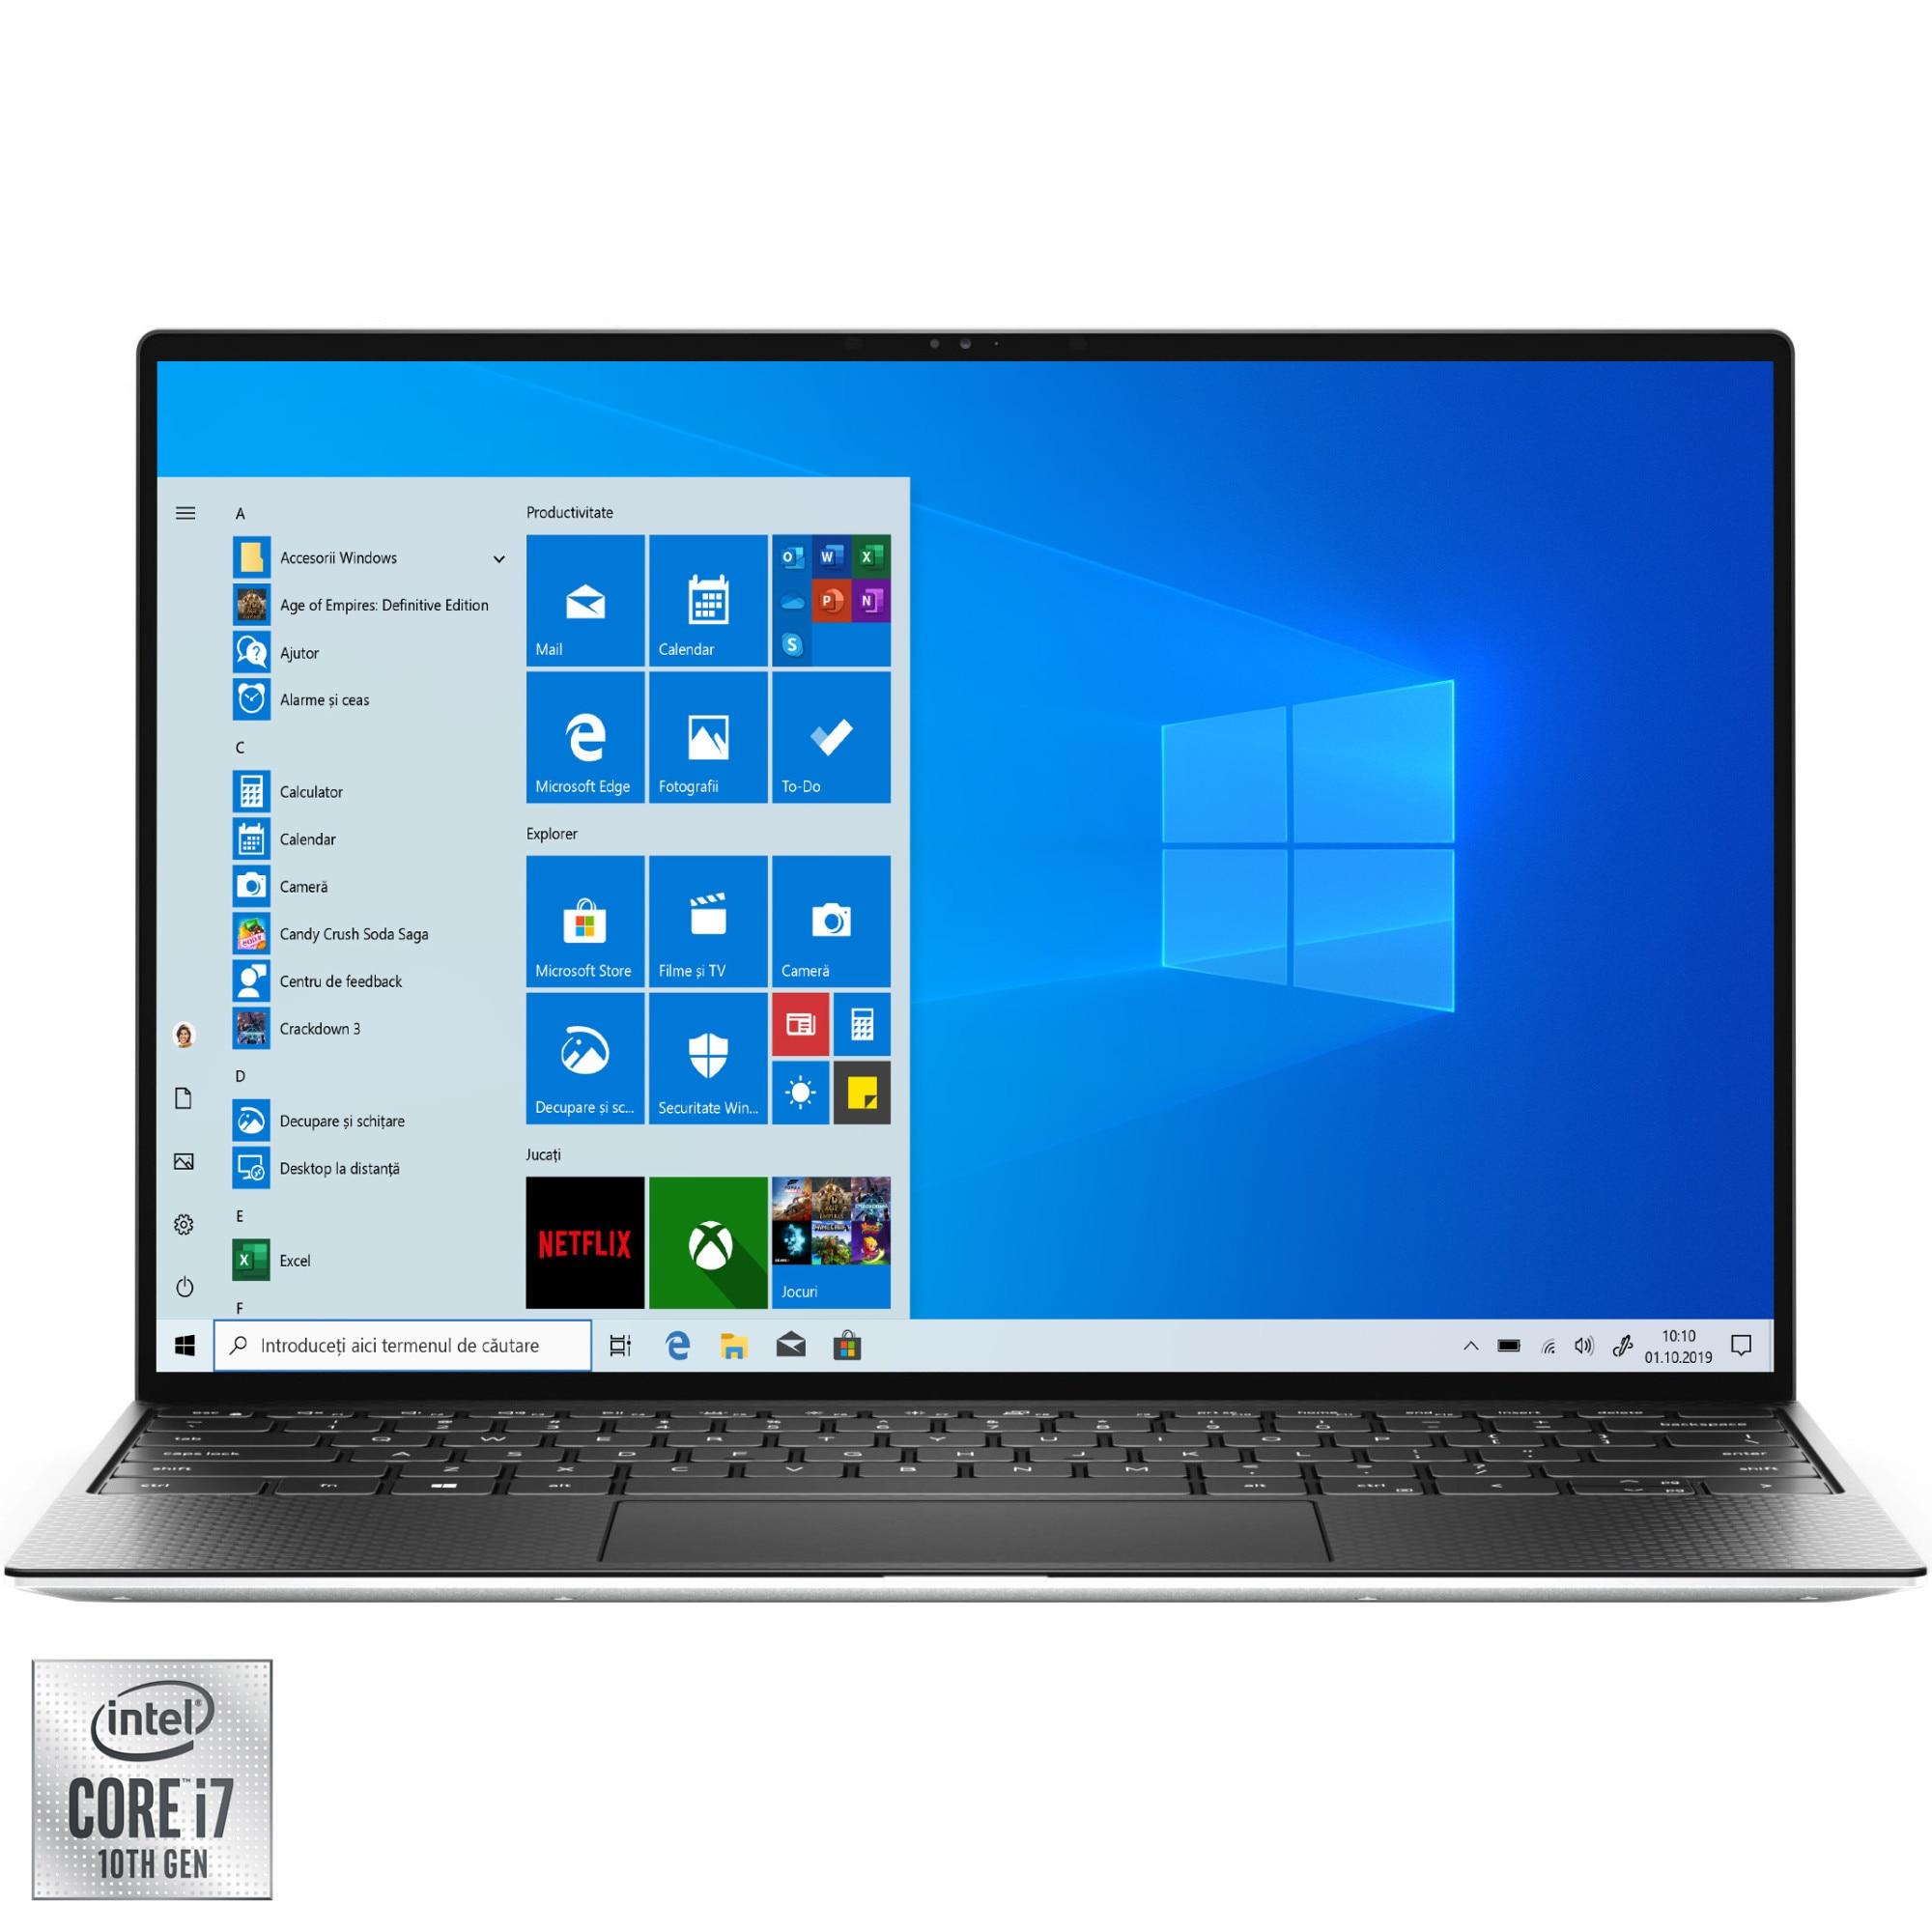 "Fotografie Laptop ultraportabil Dell XPS 13 9300 cu procesor Intel Core i7-1065G7 pana la 3.90 GHz, 13.4"", Full HD, 8GB, 512GB, Intel Iris Plus Graphics, Windows 10 Pro, Platinum silver"